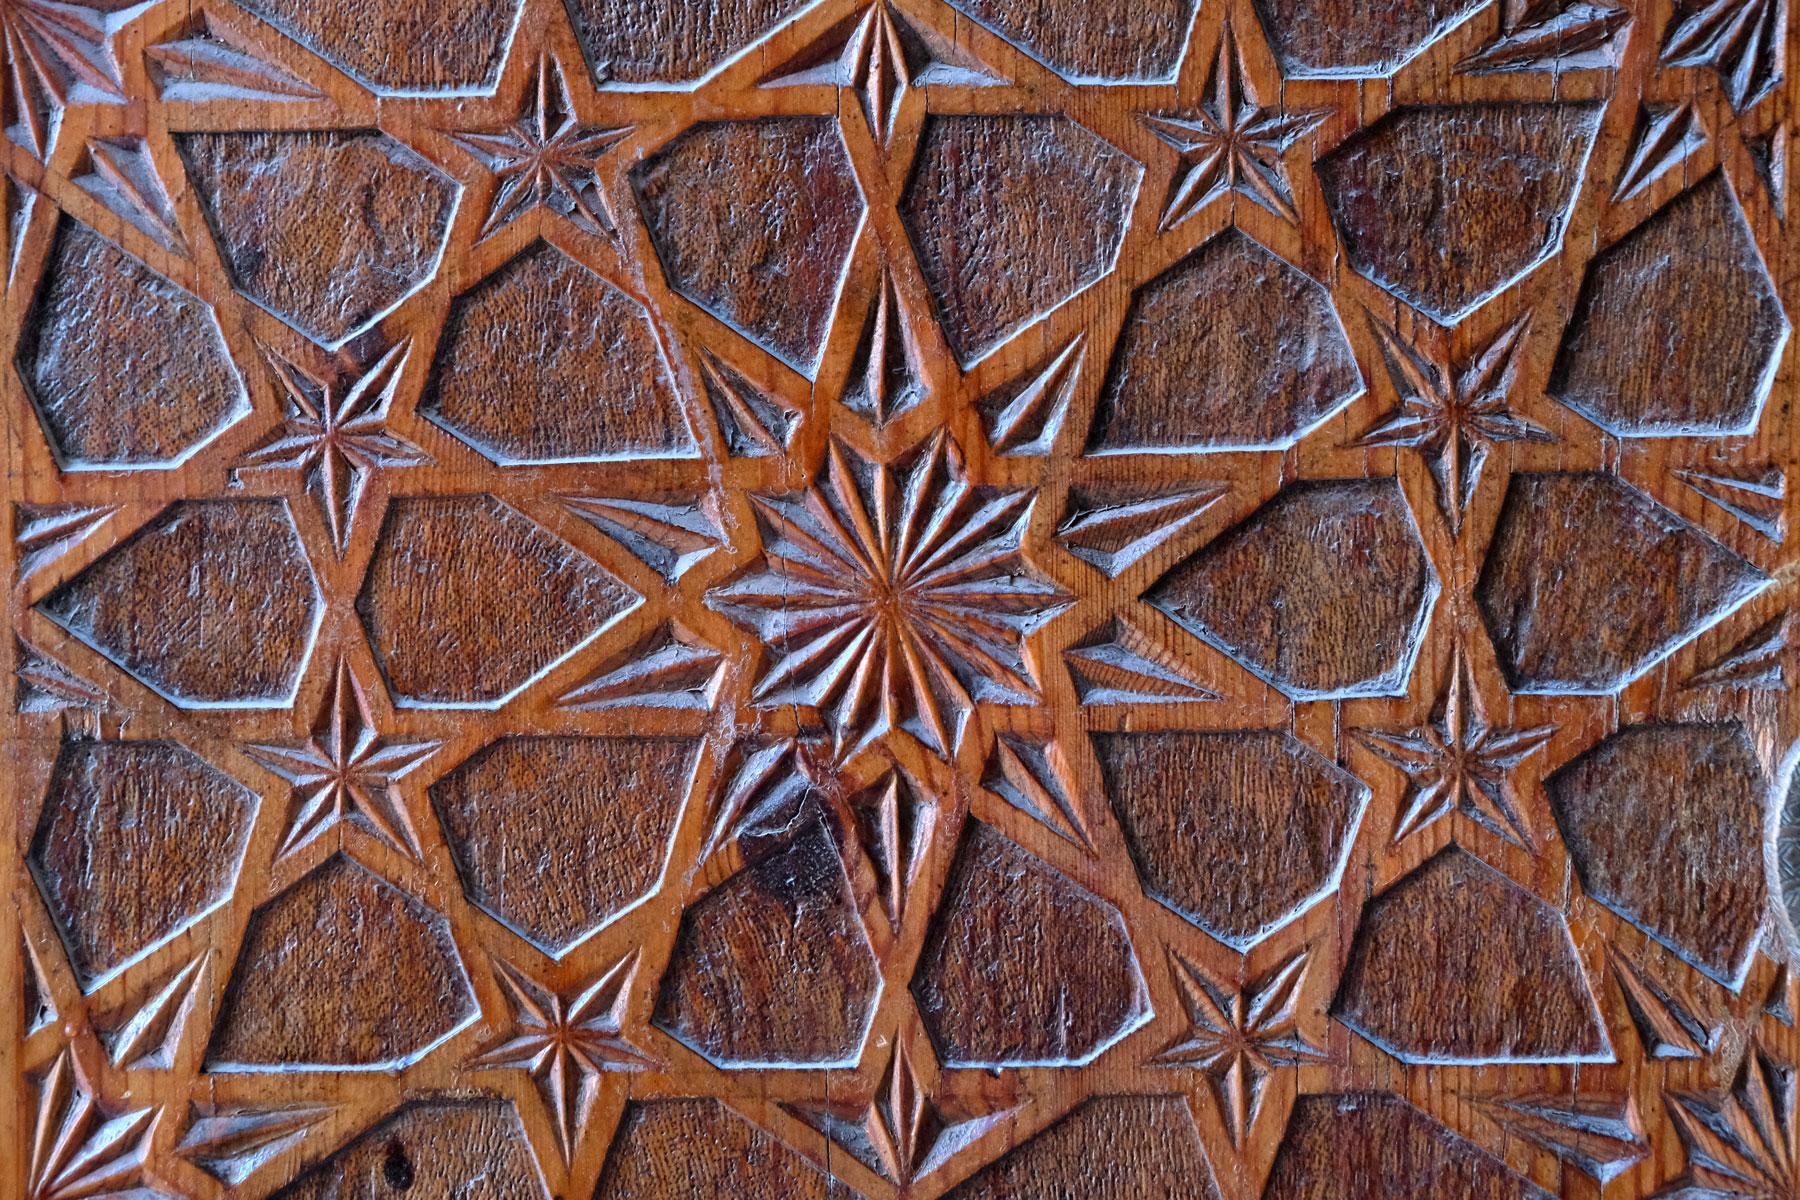 Kunstvoll verziertes Eingangstor aus Holz